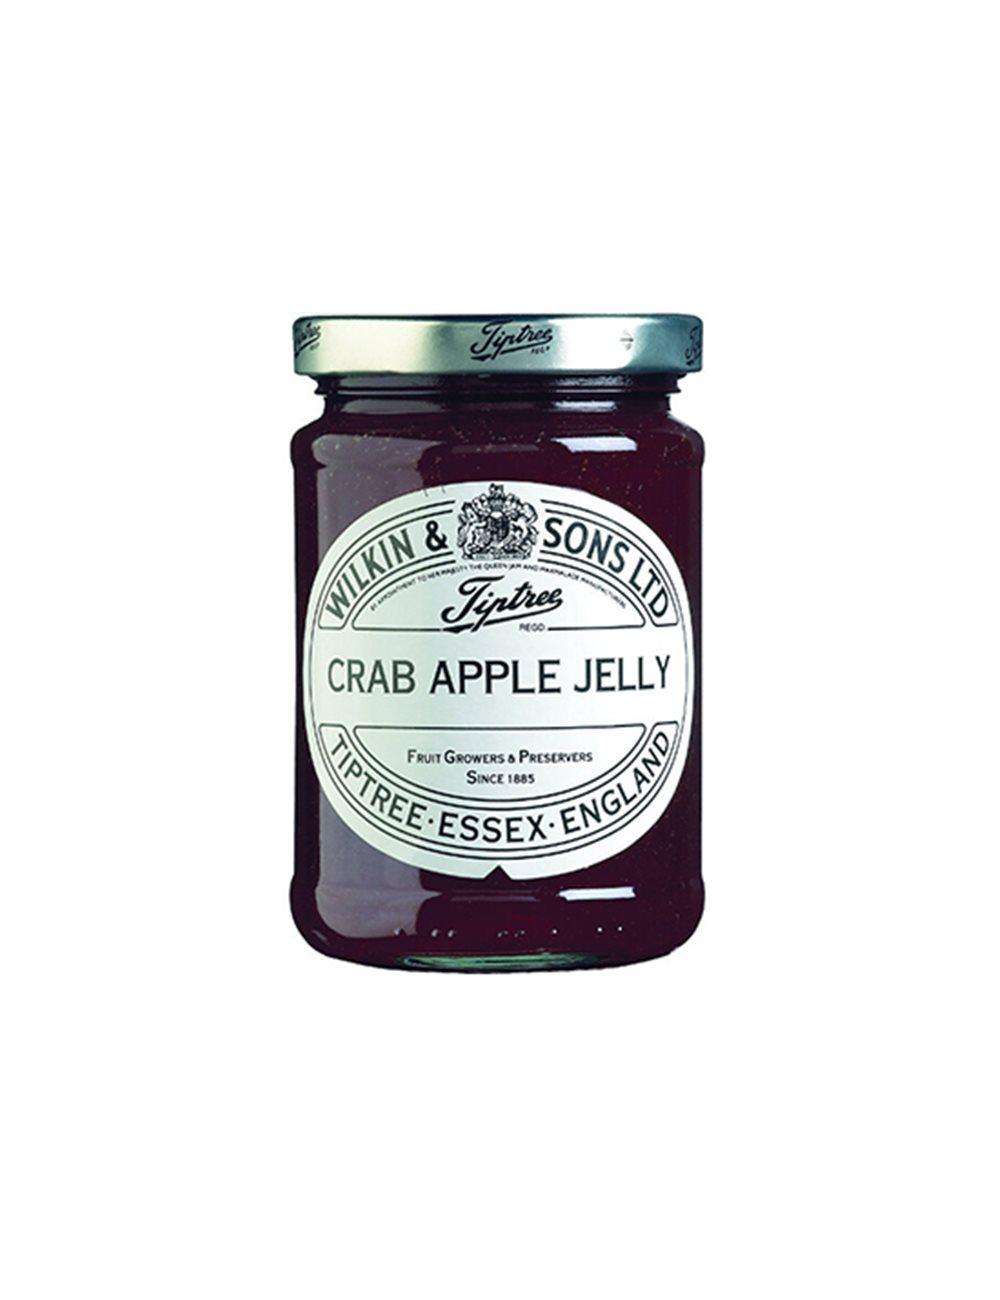 Crabapple Jelly 340g